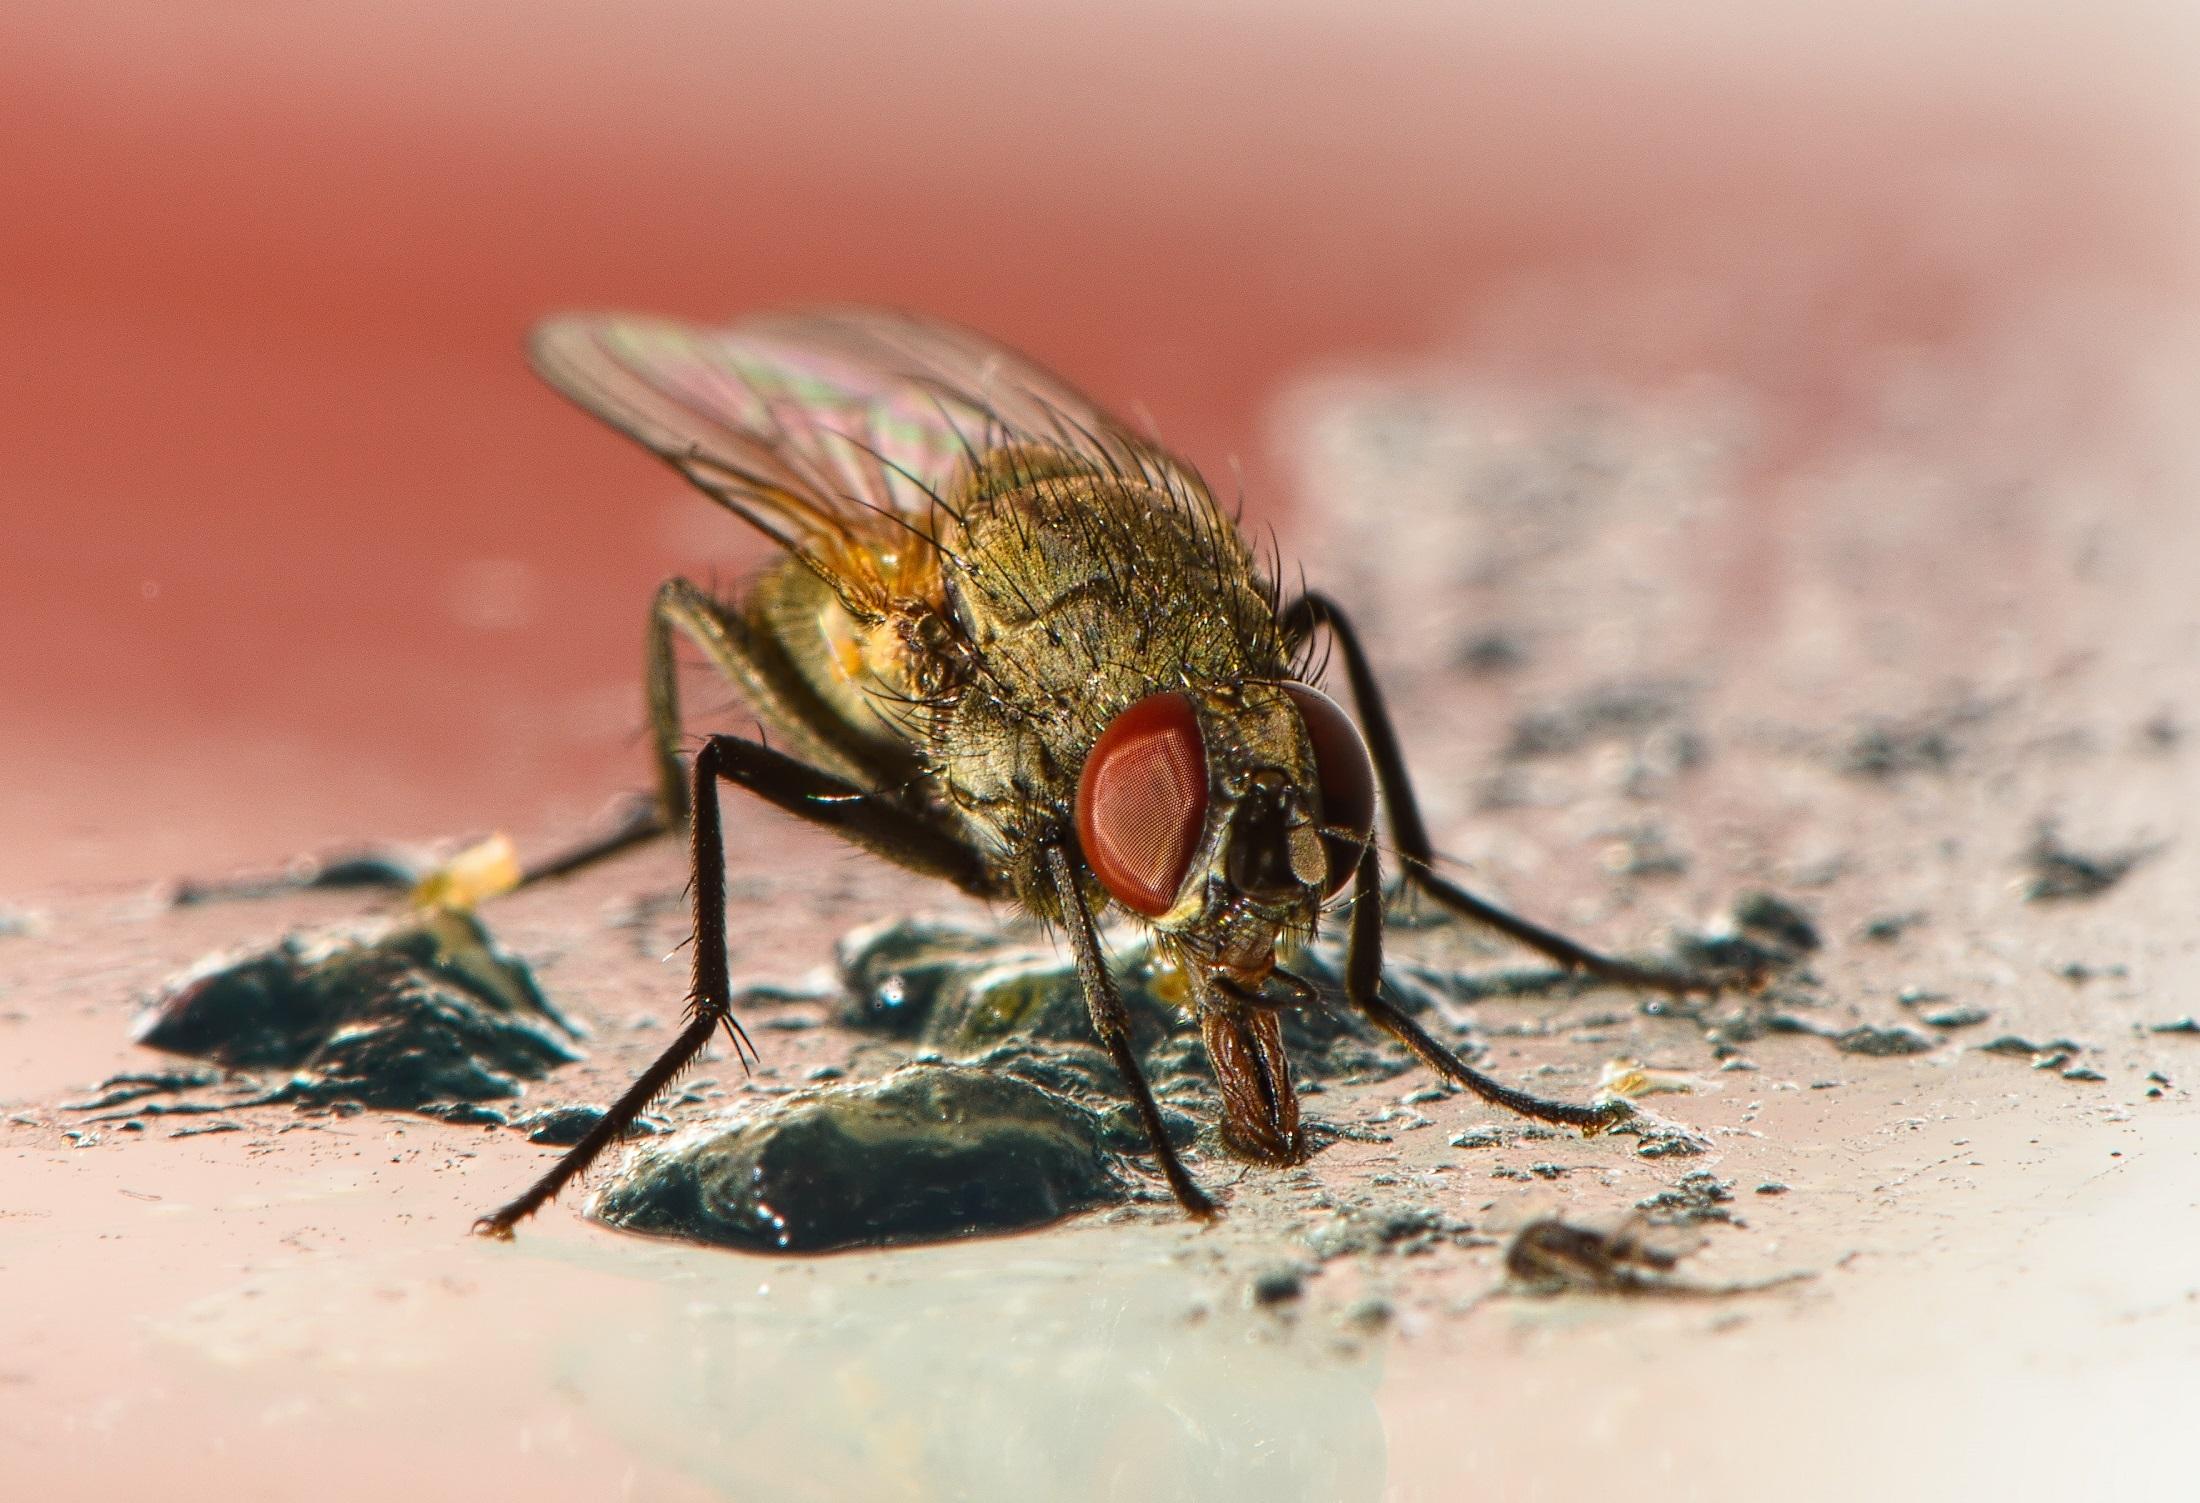 Fly Closeup, Animal, Close, Closeup, Fly, HQ Photo